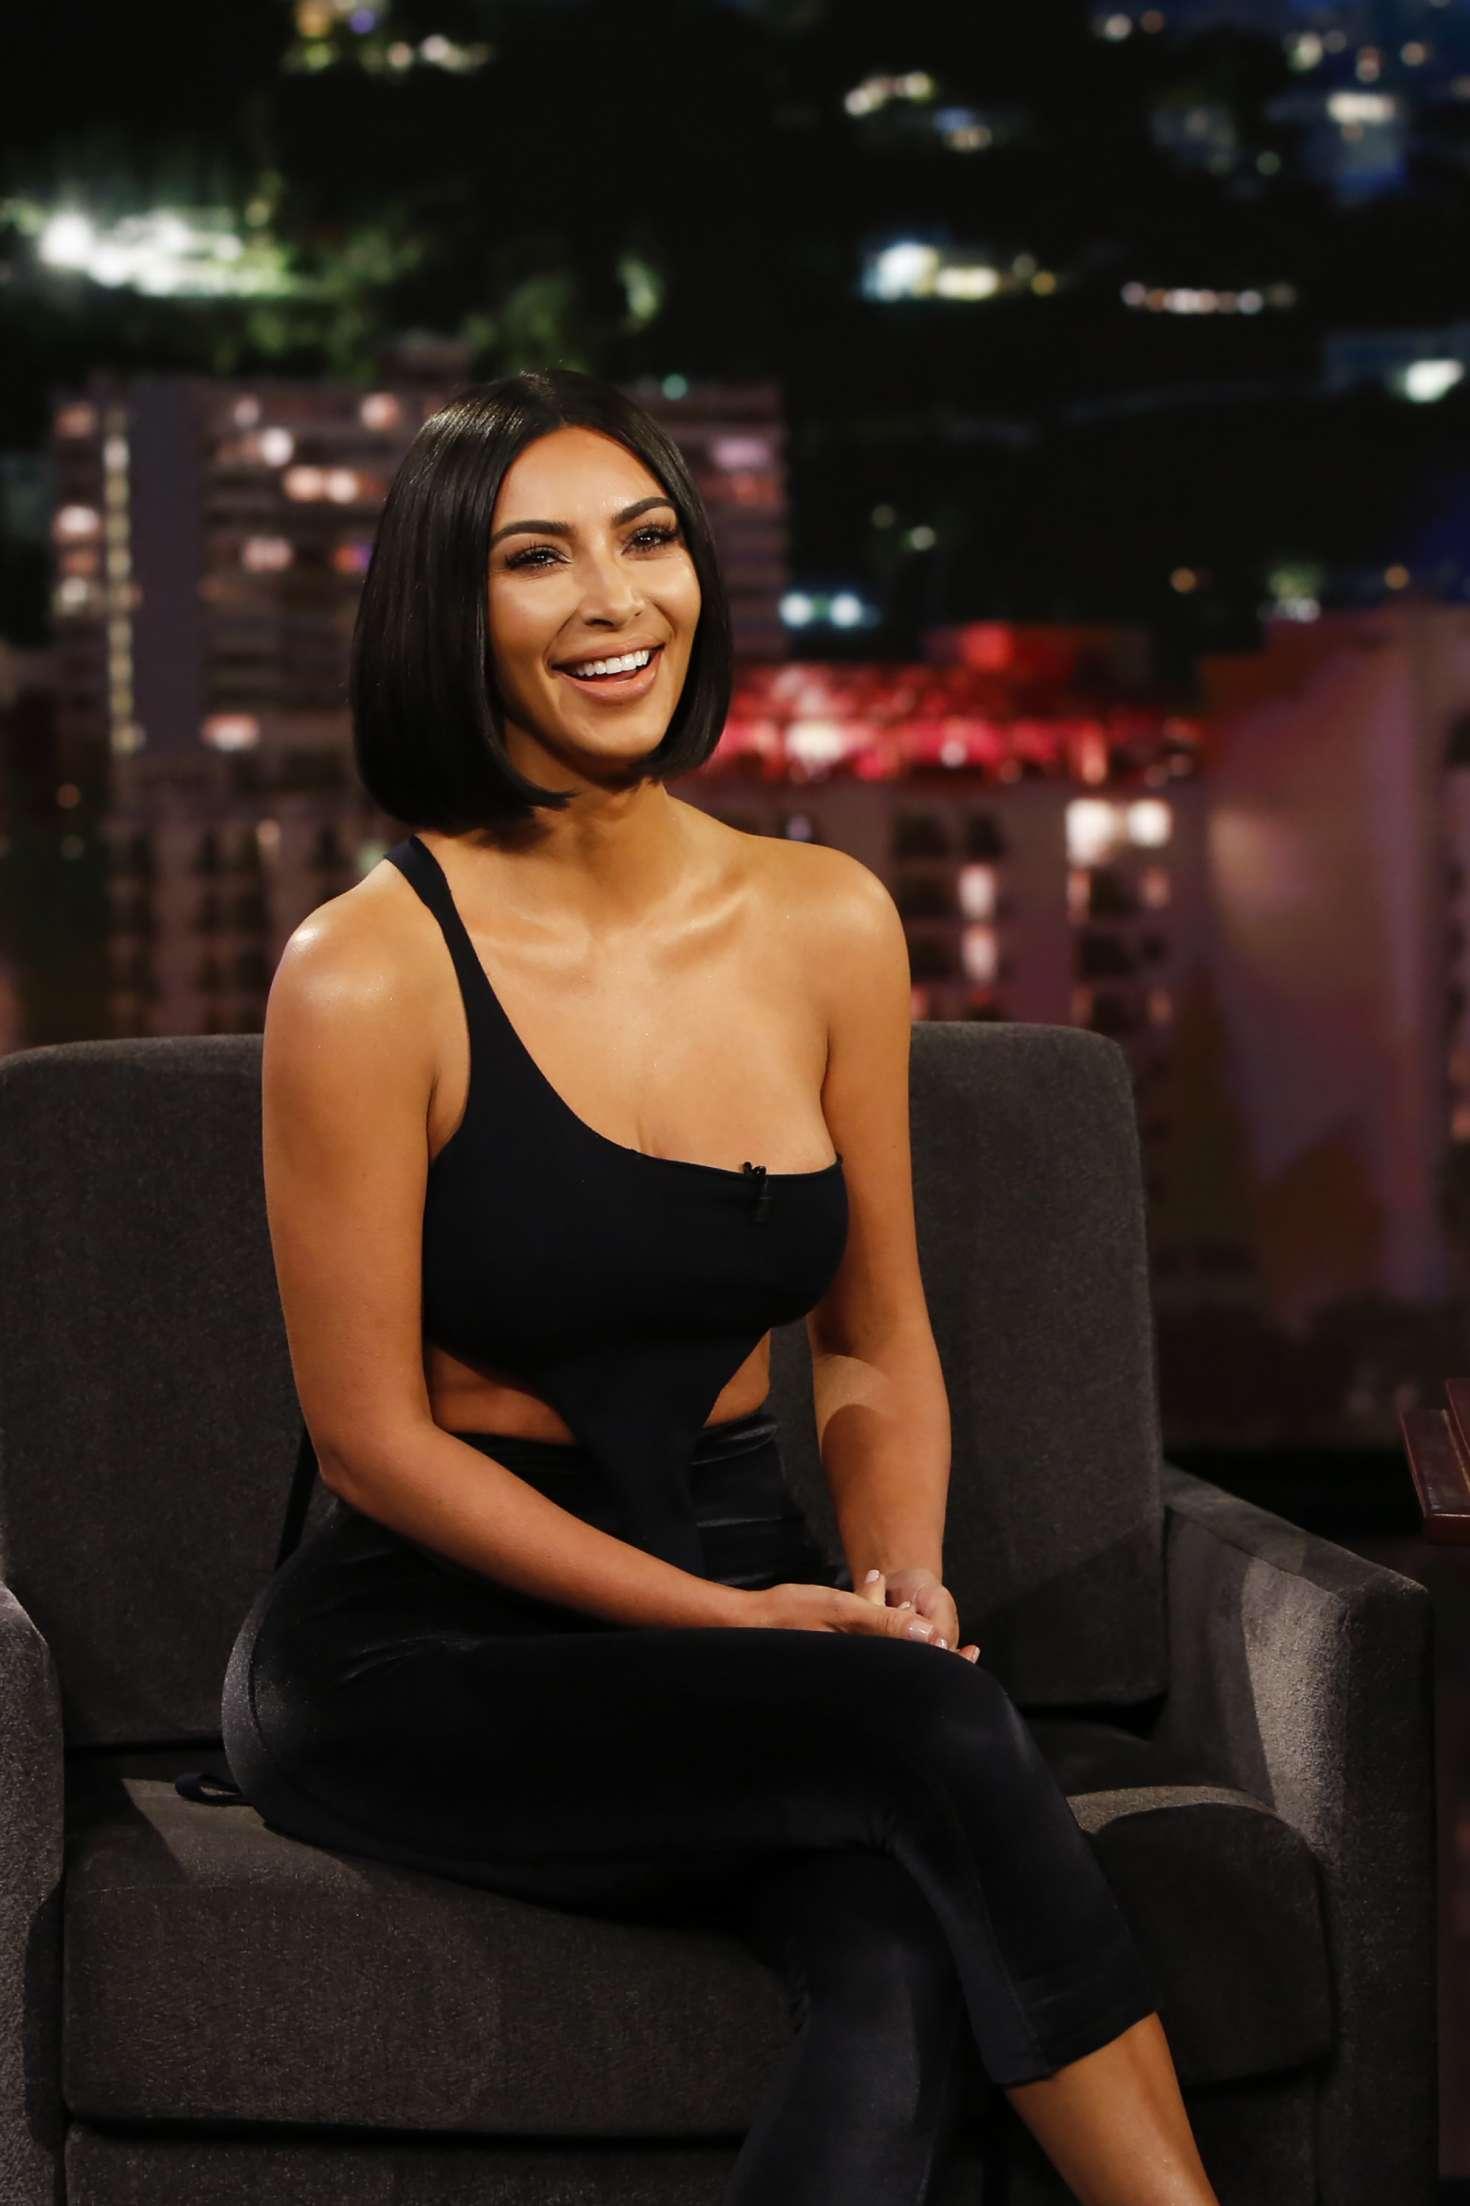 Kim Kardashian at Jimmy Kimmel Live! in Los Angeles